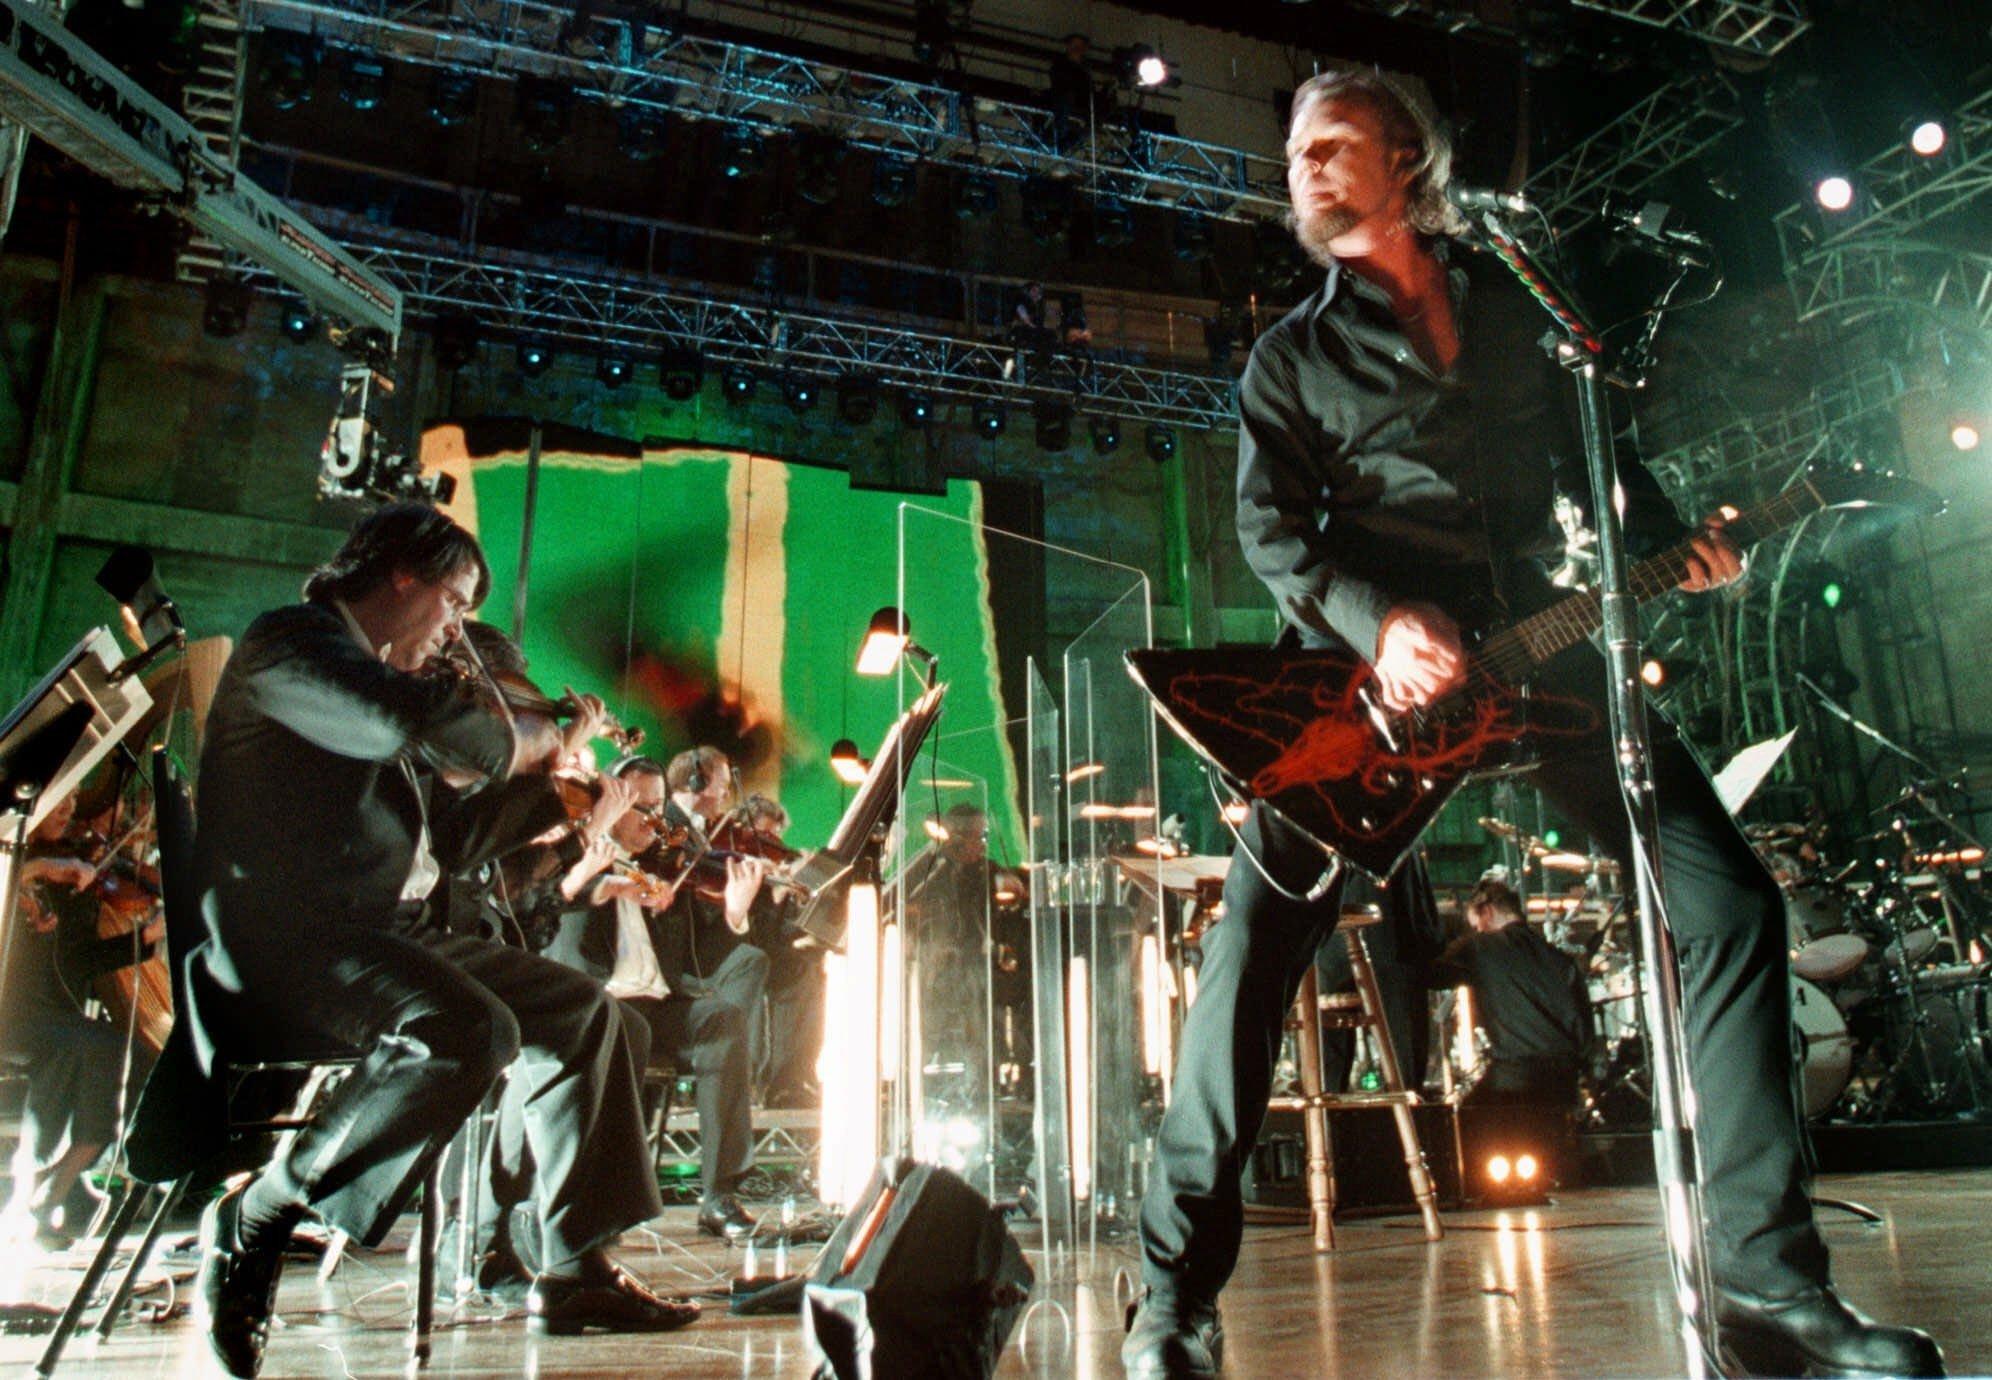 Orquestra e banda de rock Metallica